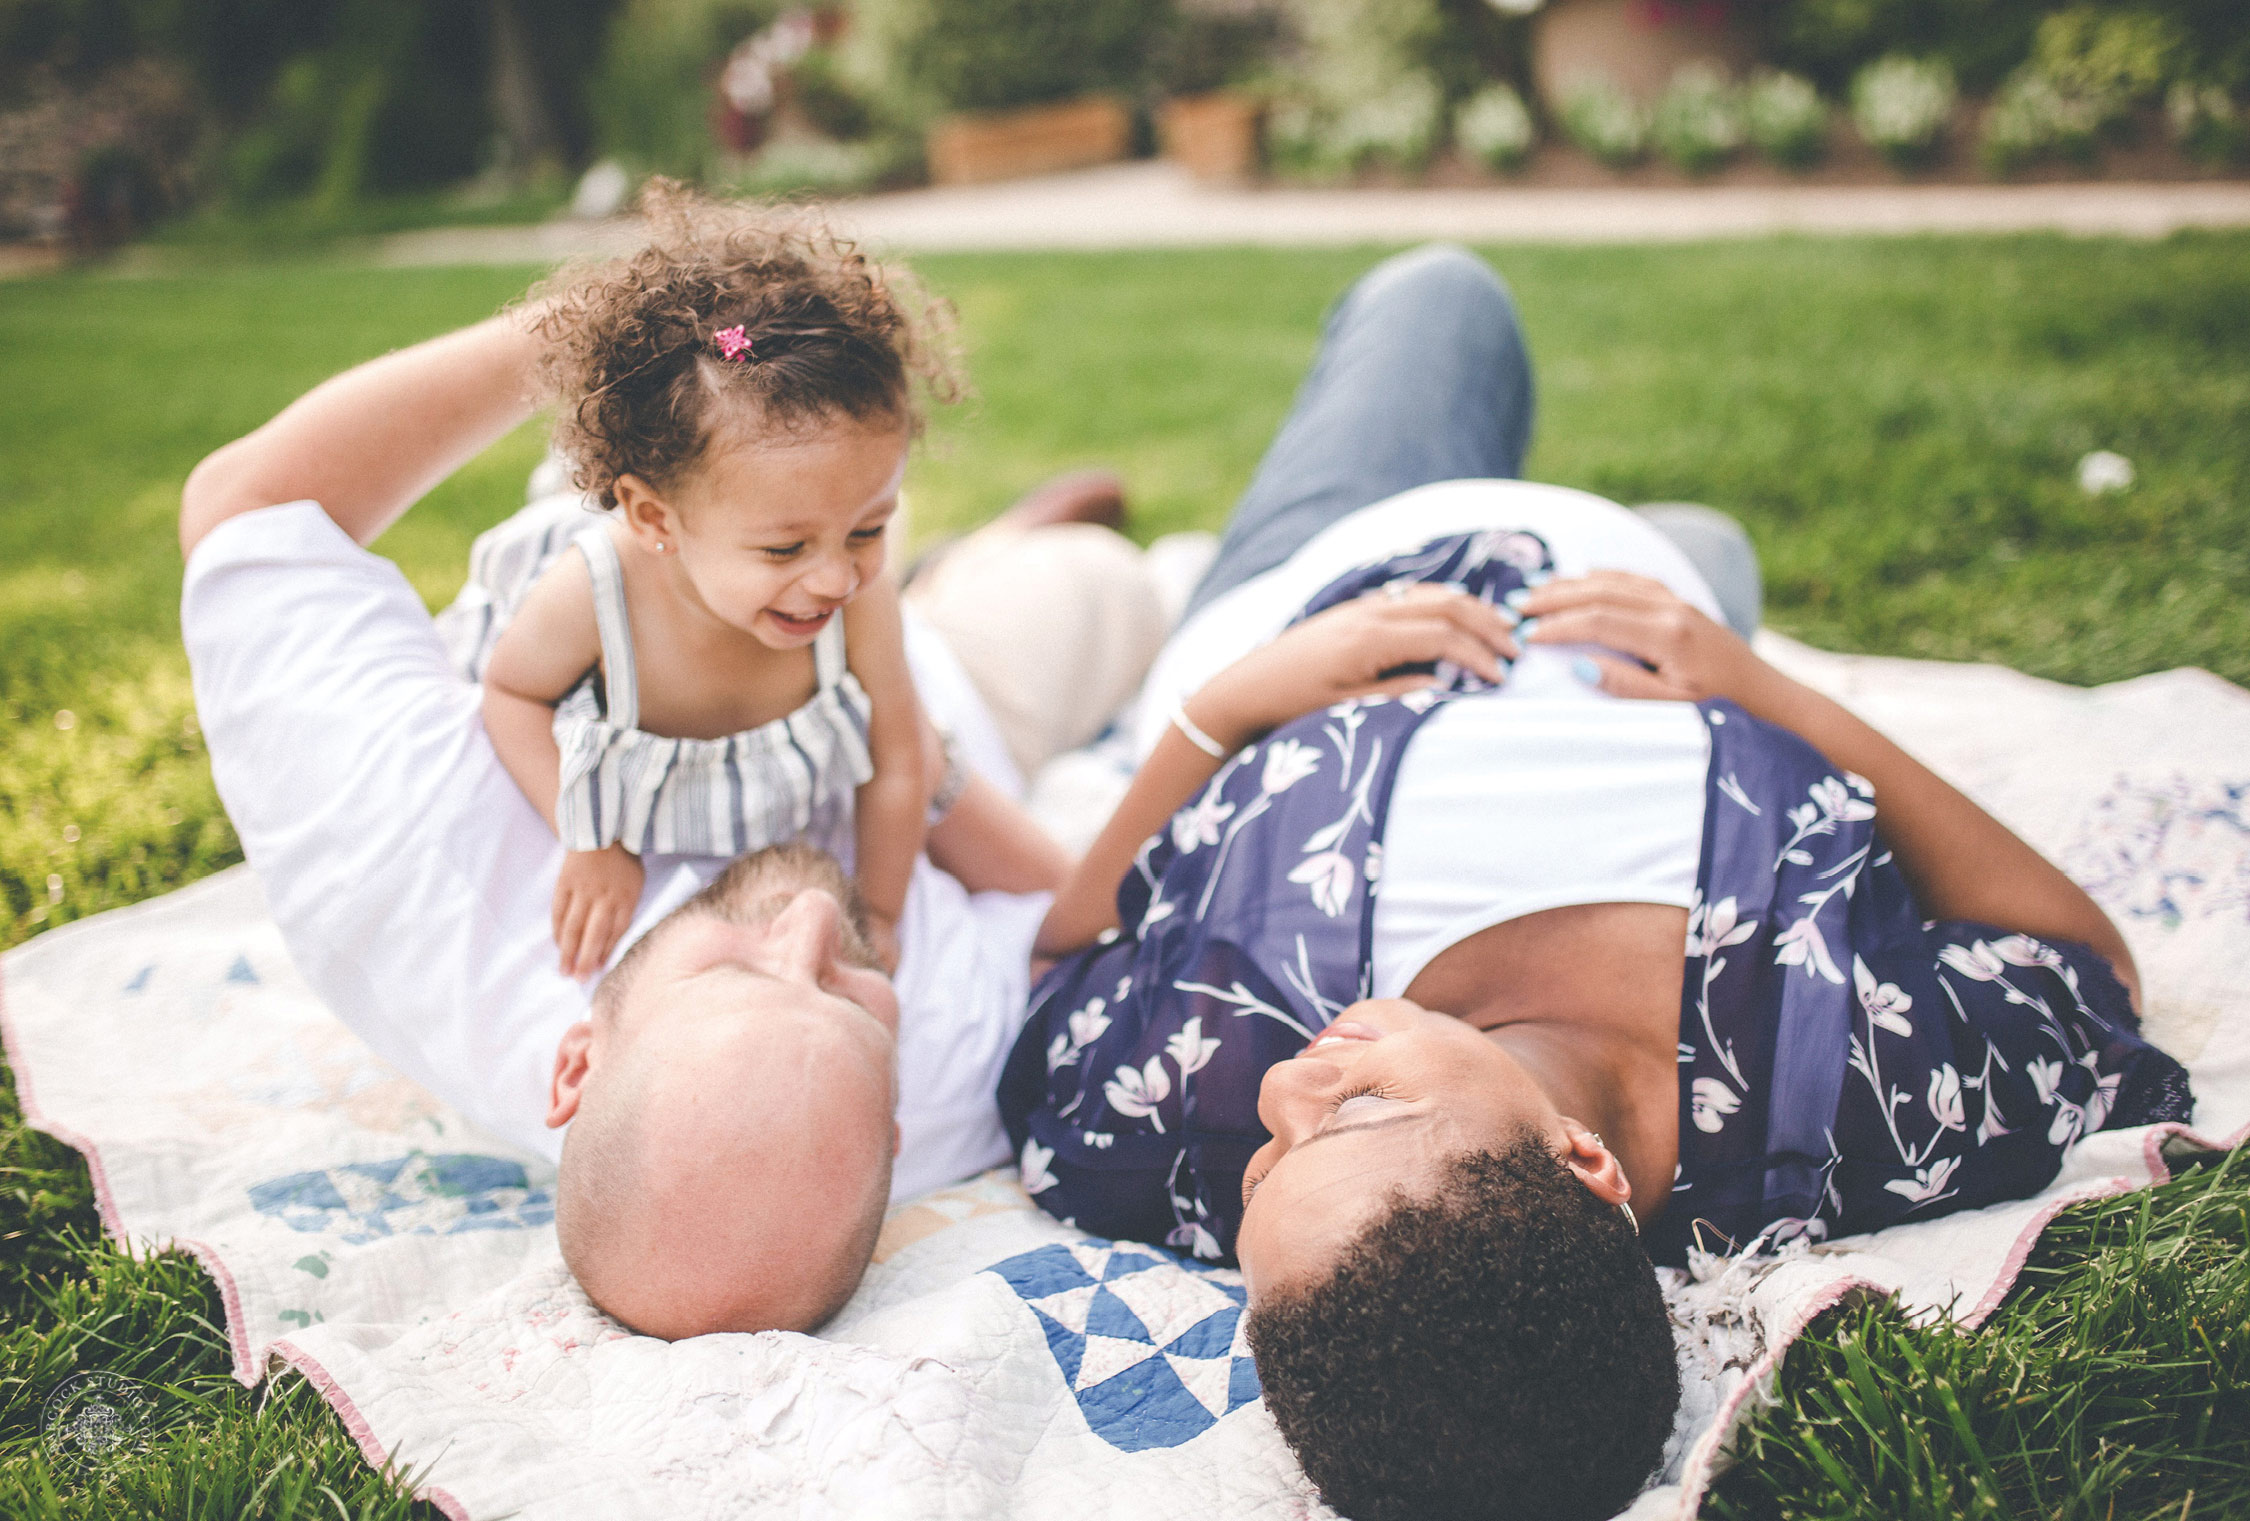 brande-langston-maternity-pregnancy-photographer-dayton-ohio-3.jpg